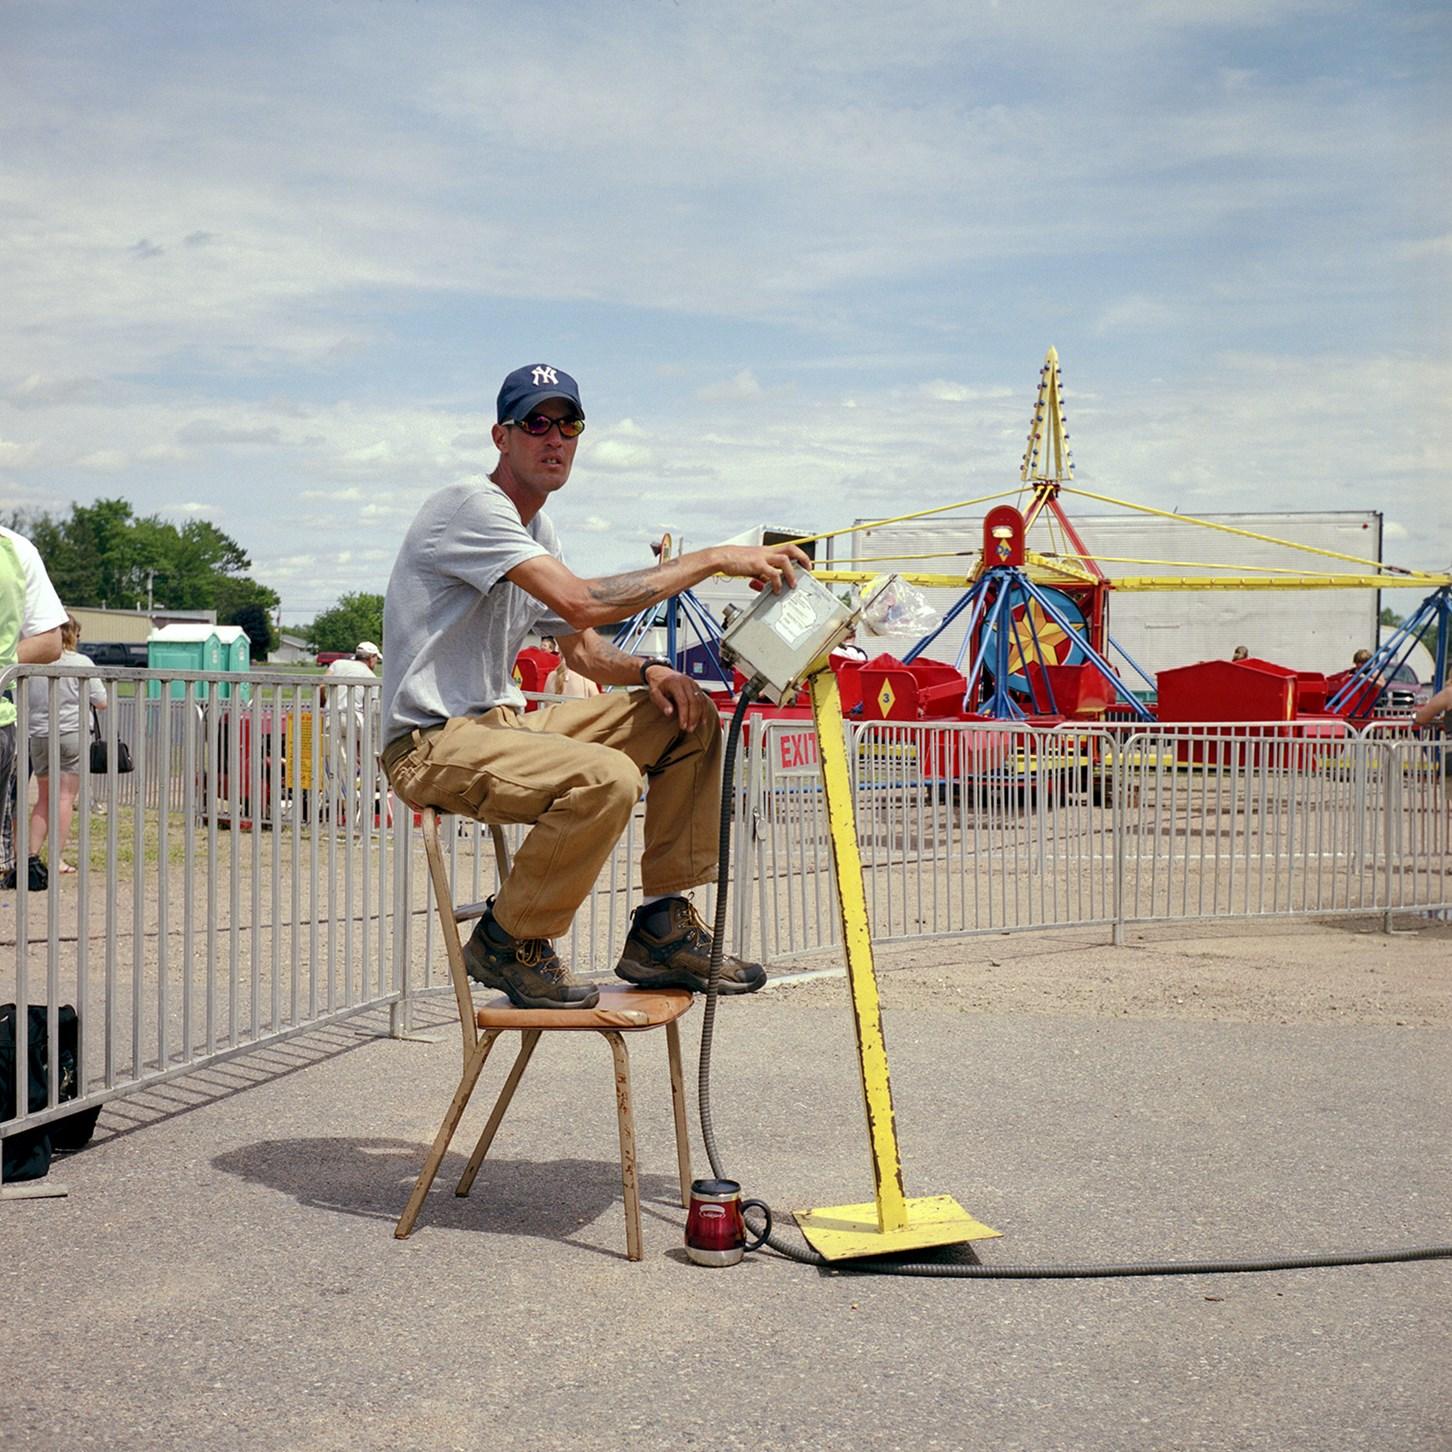 Carnival Ride Operator, Birnamwood, Wisconsin, June 2010